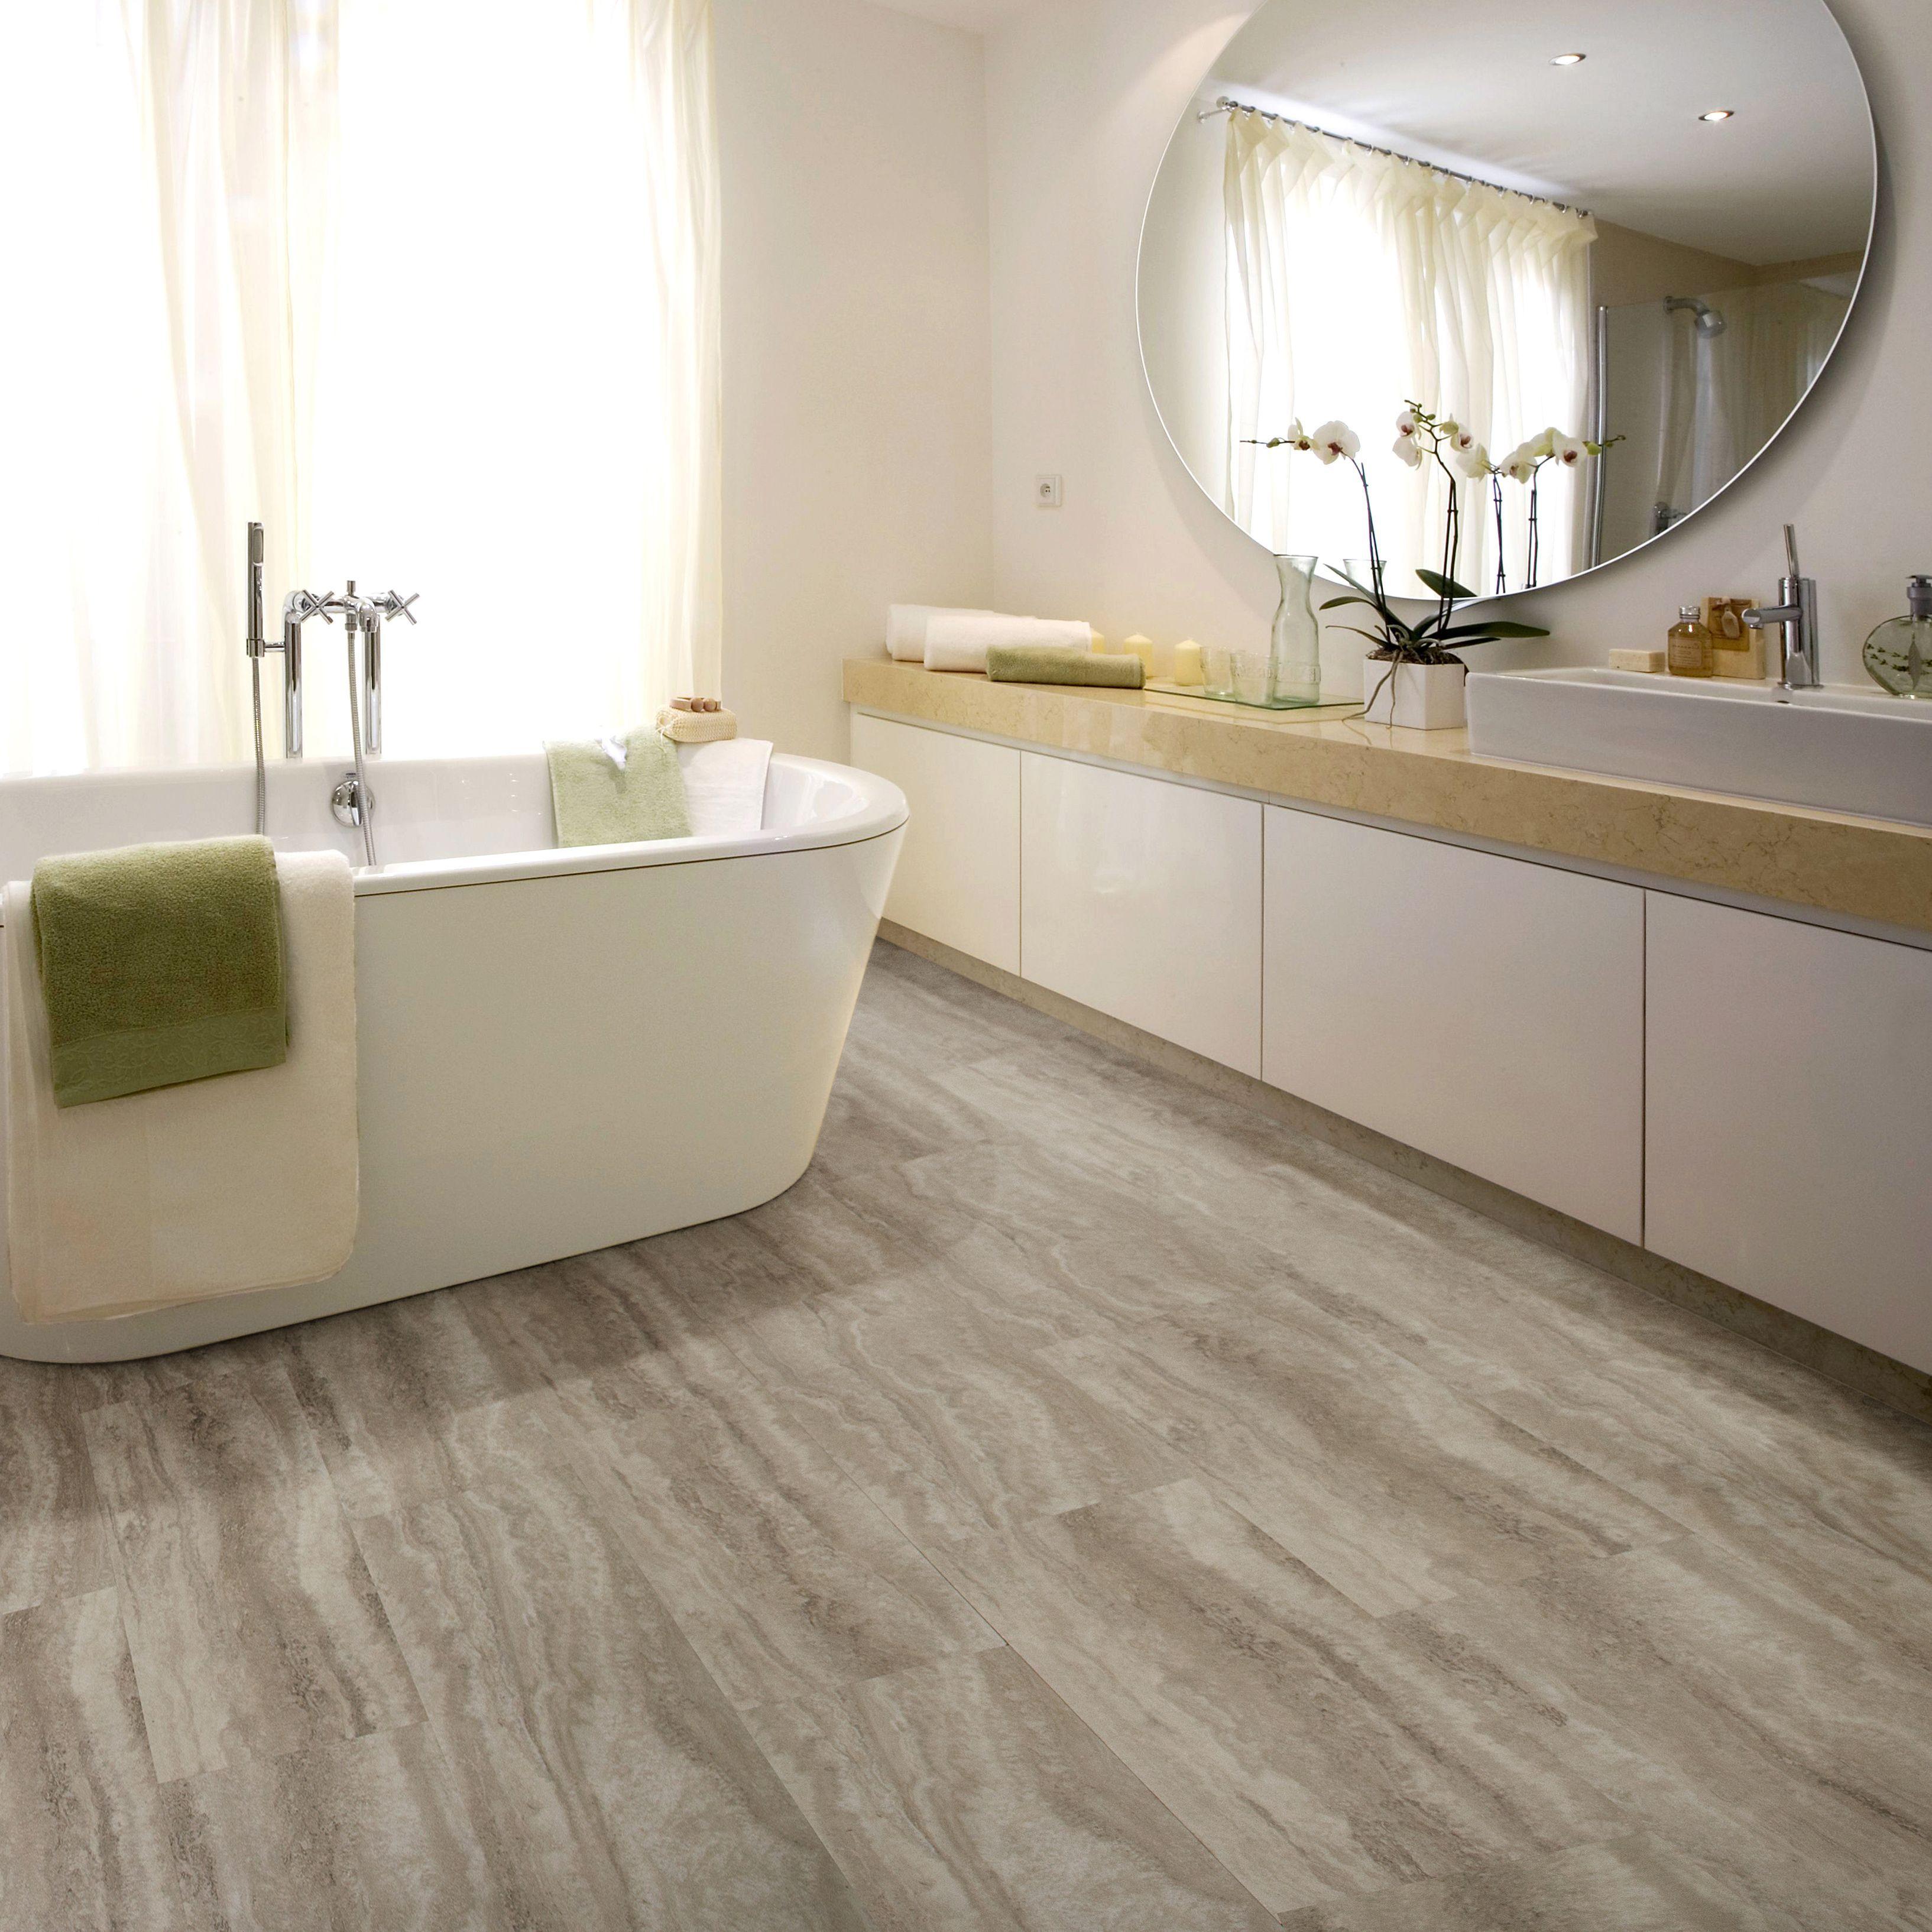 Natural Sand Effect Waterproof Luxury Vinyl Click Flooring